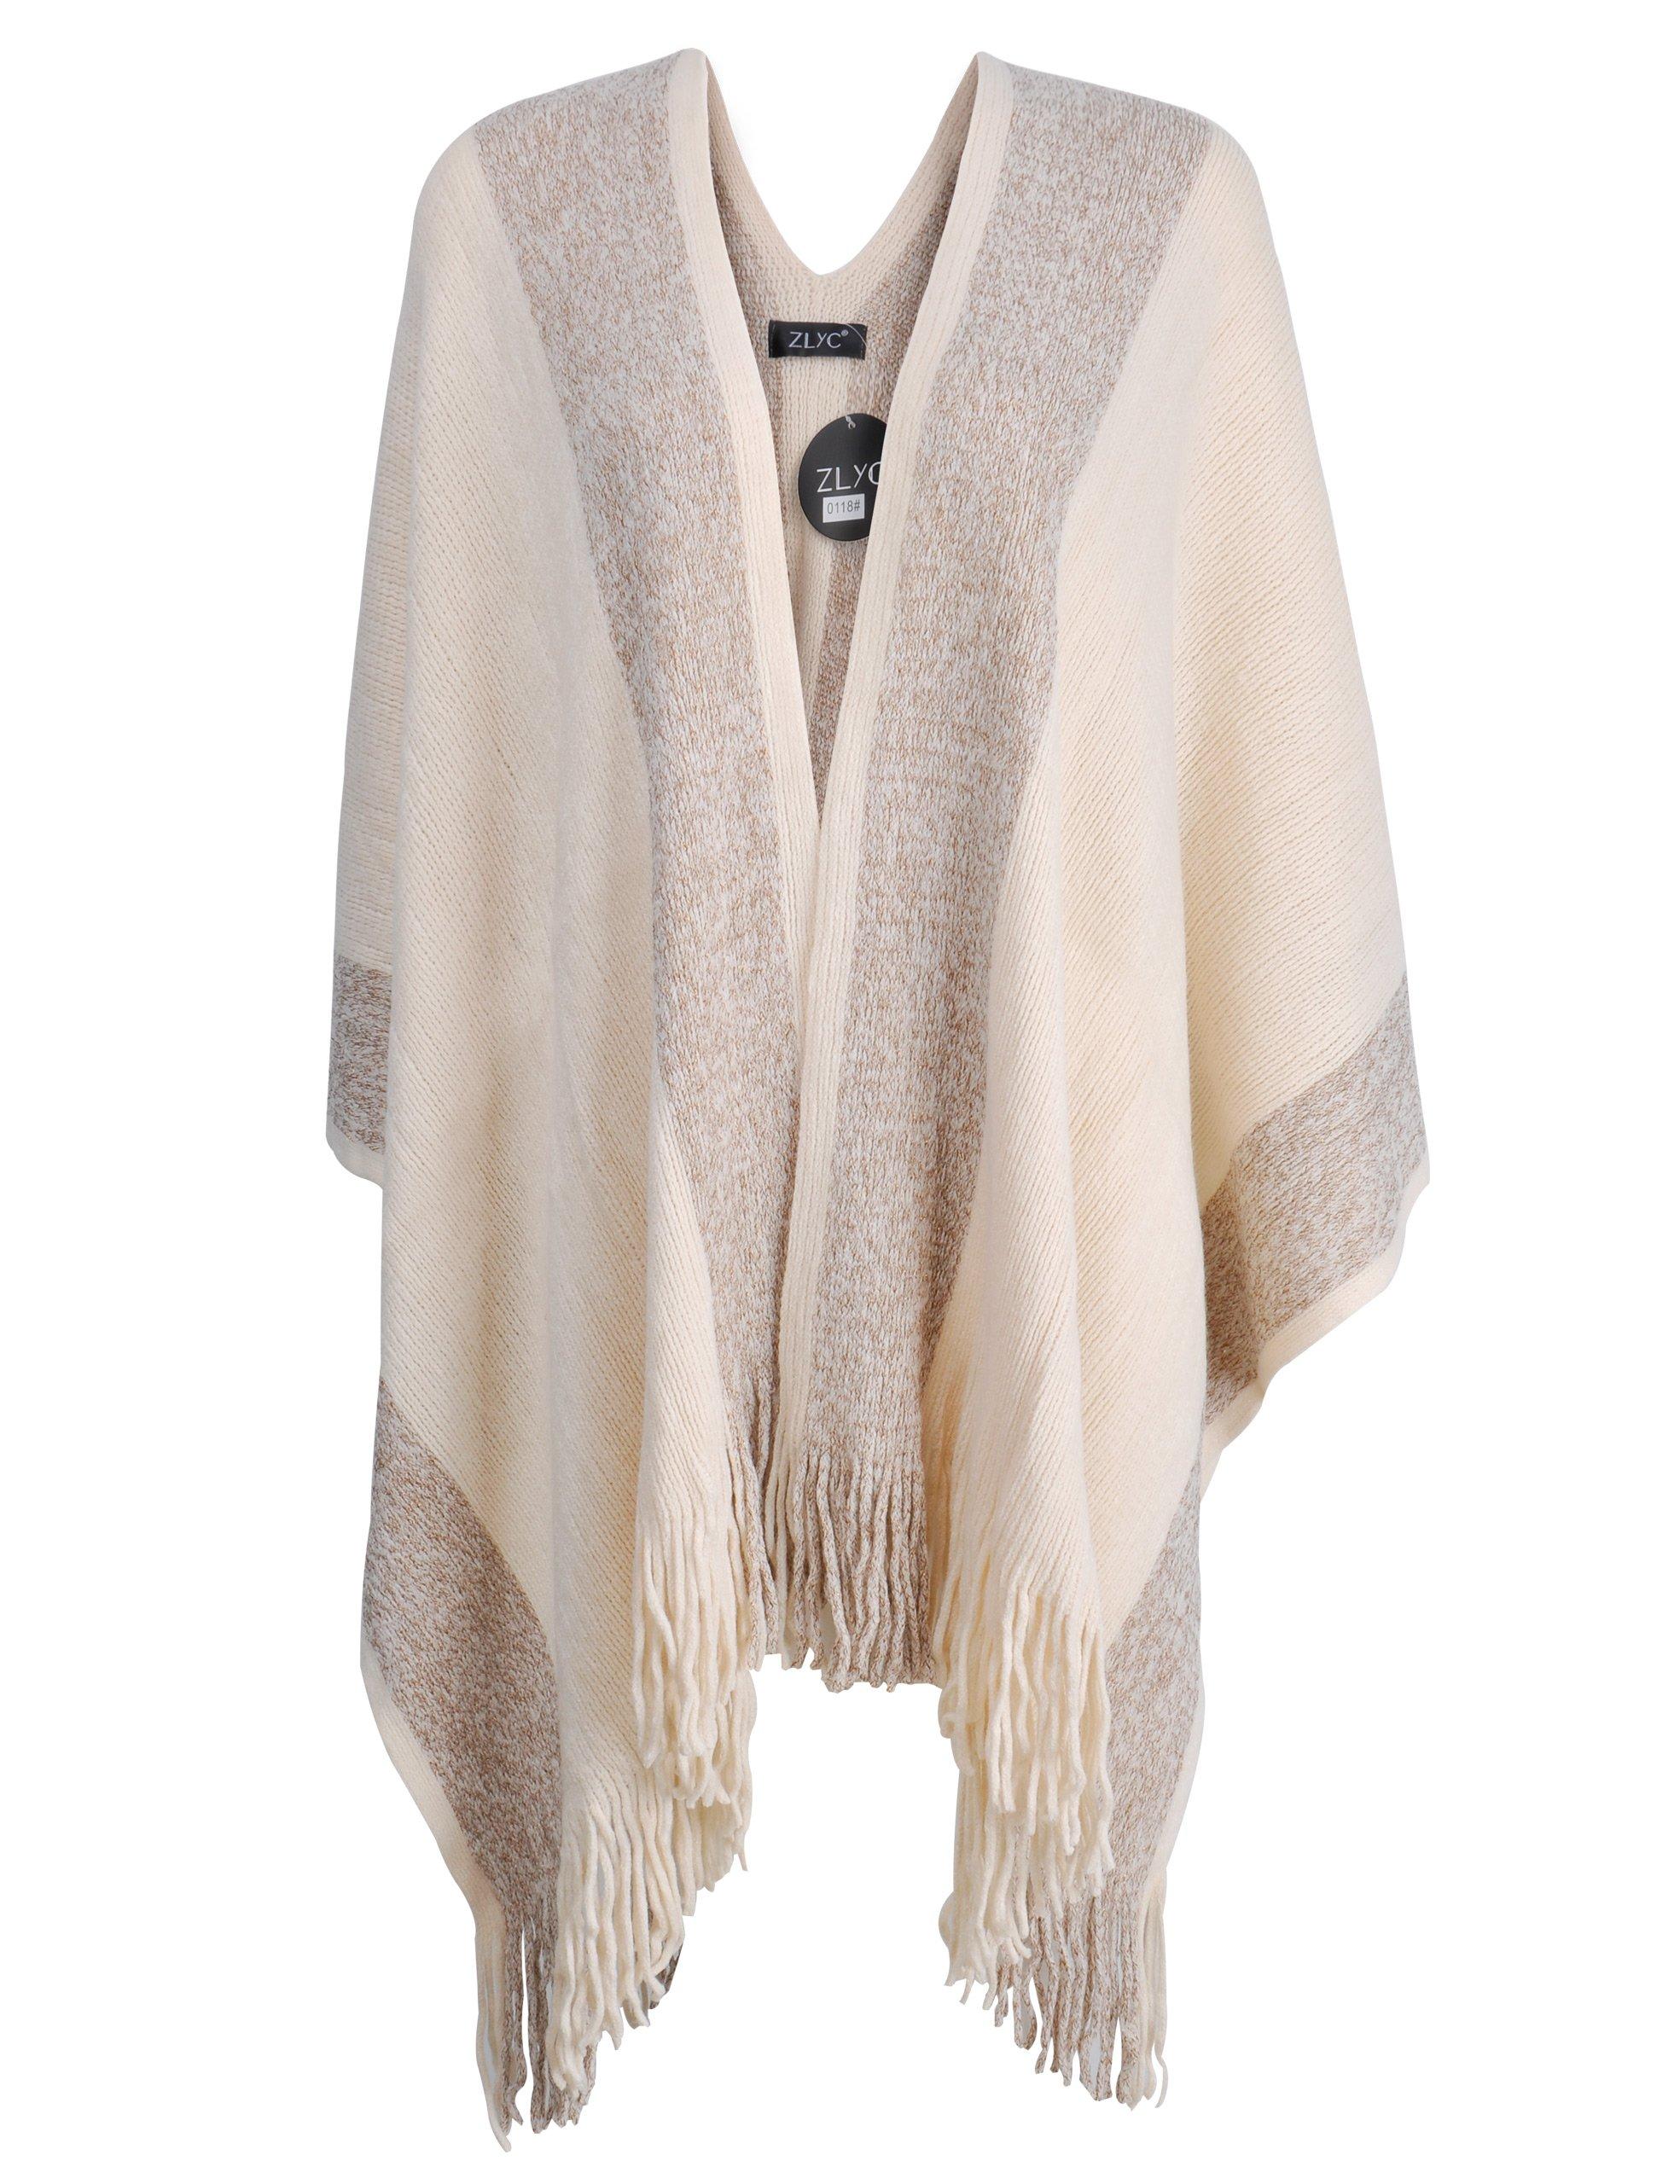 ZLYC Women's Shawl Golden Trim Knit Blanket Wrap Fringe Poncho Coat Cardigan (Khaki)